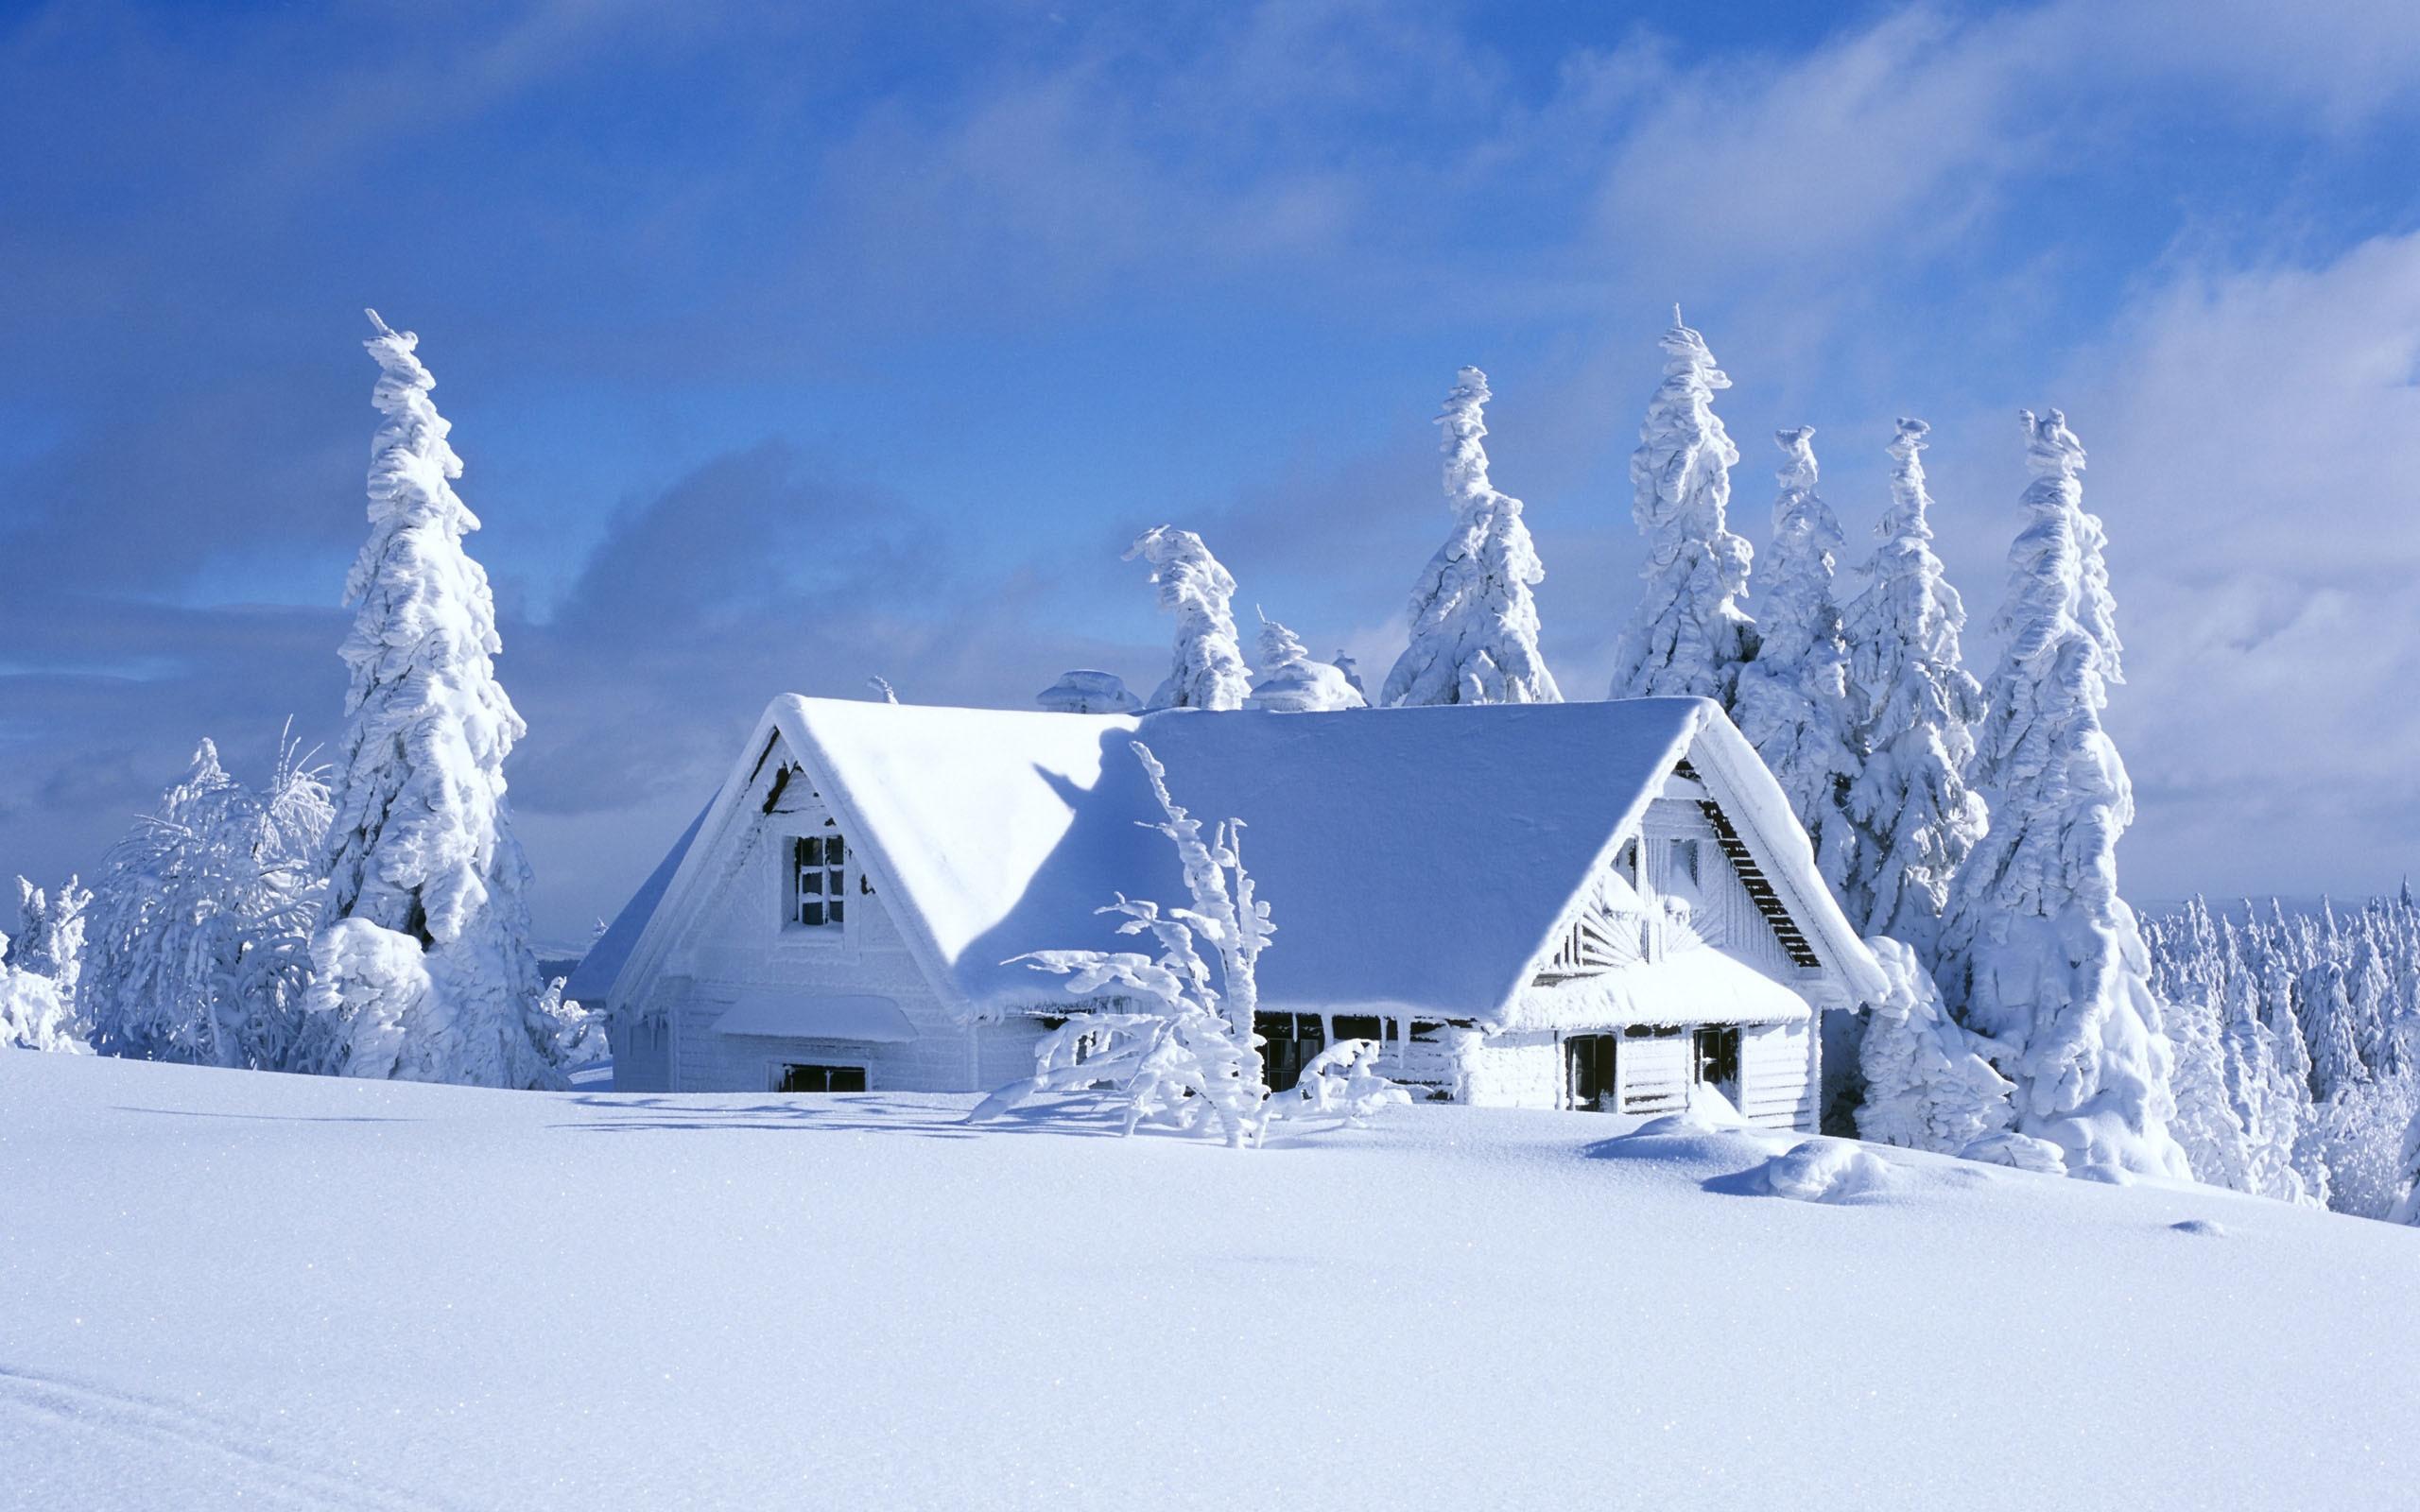 Free Desktop Winter Wallpapers